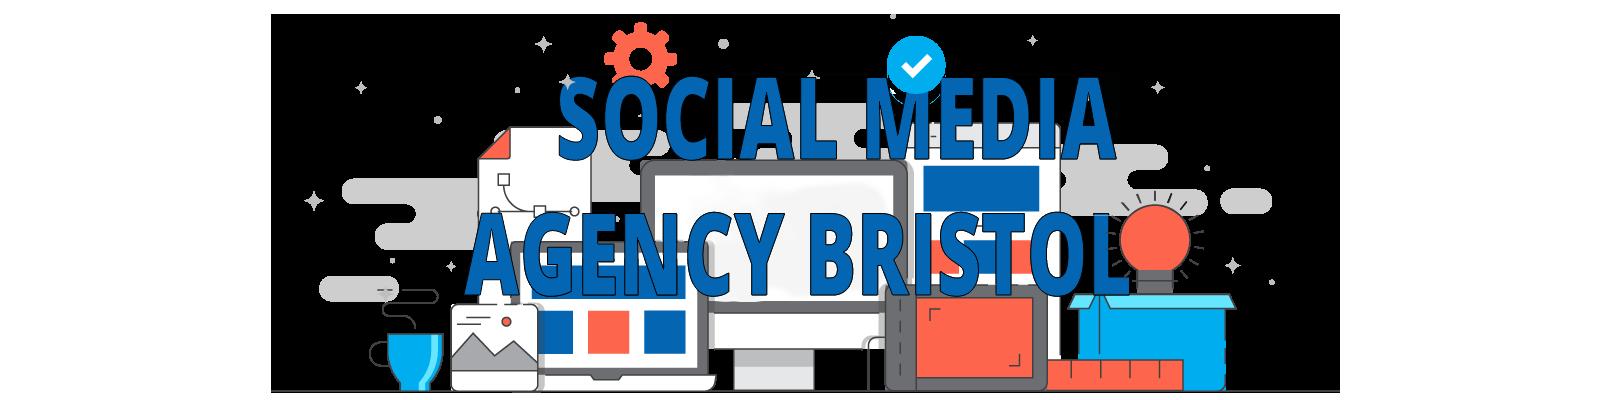 seek social social media agency bristol header with transparent background